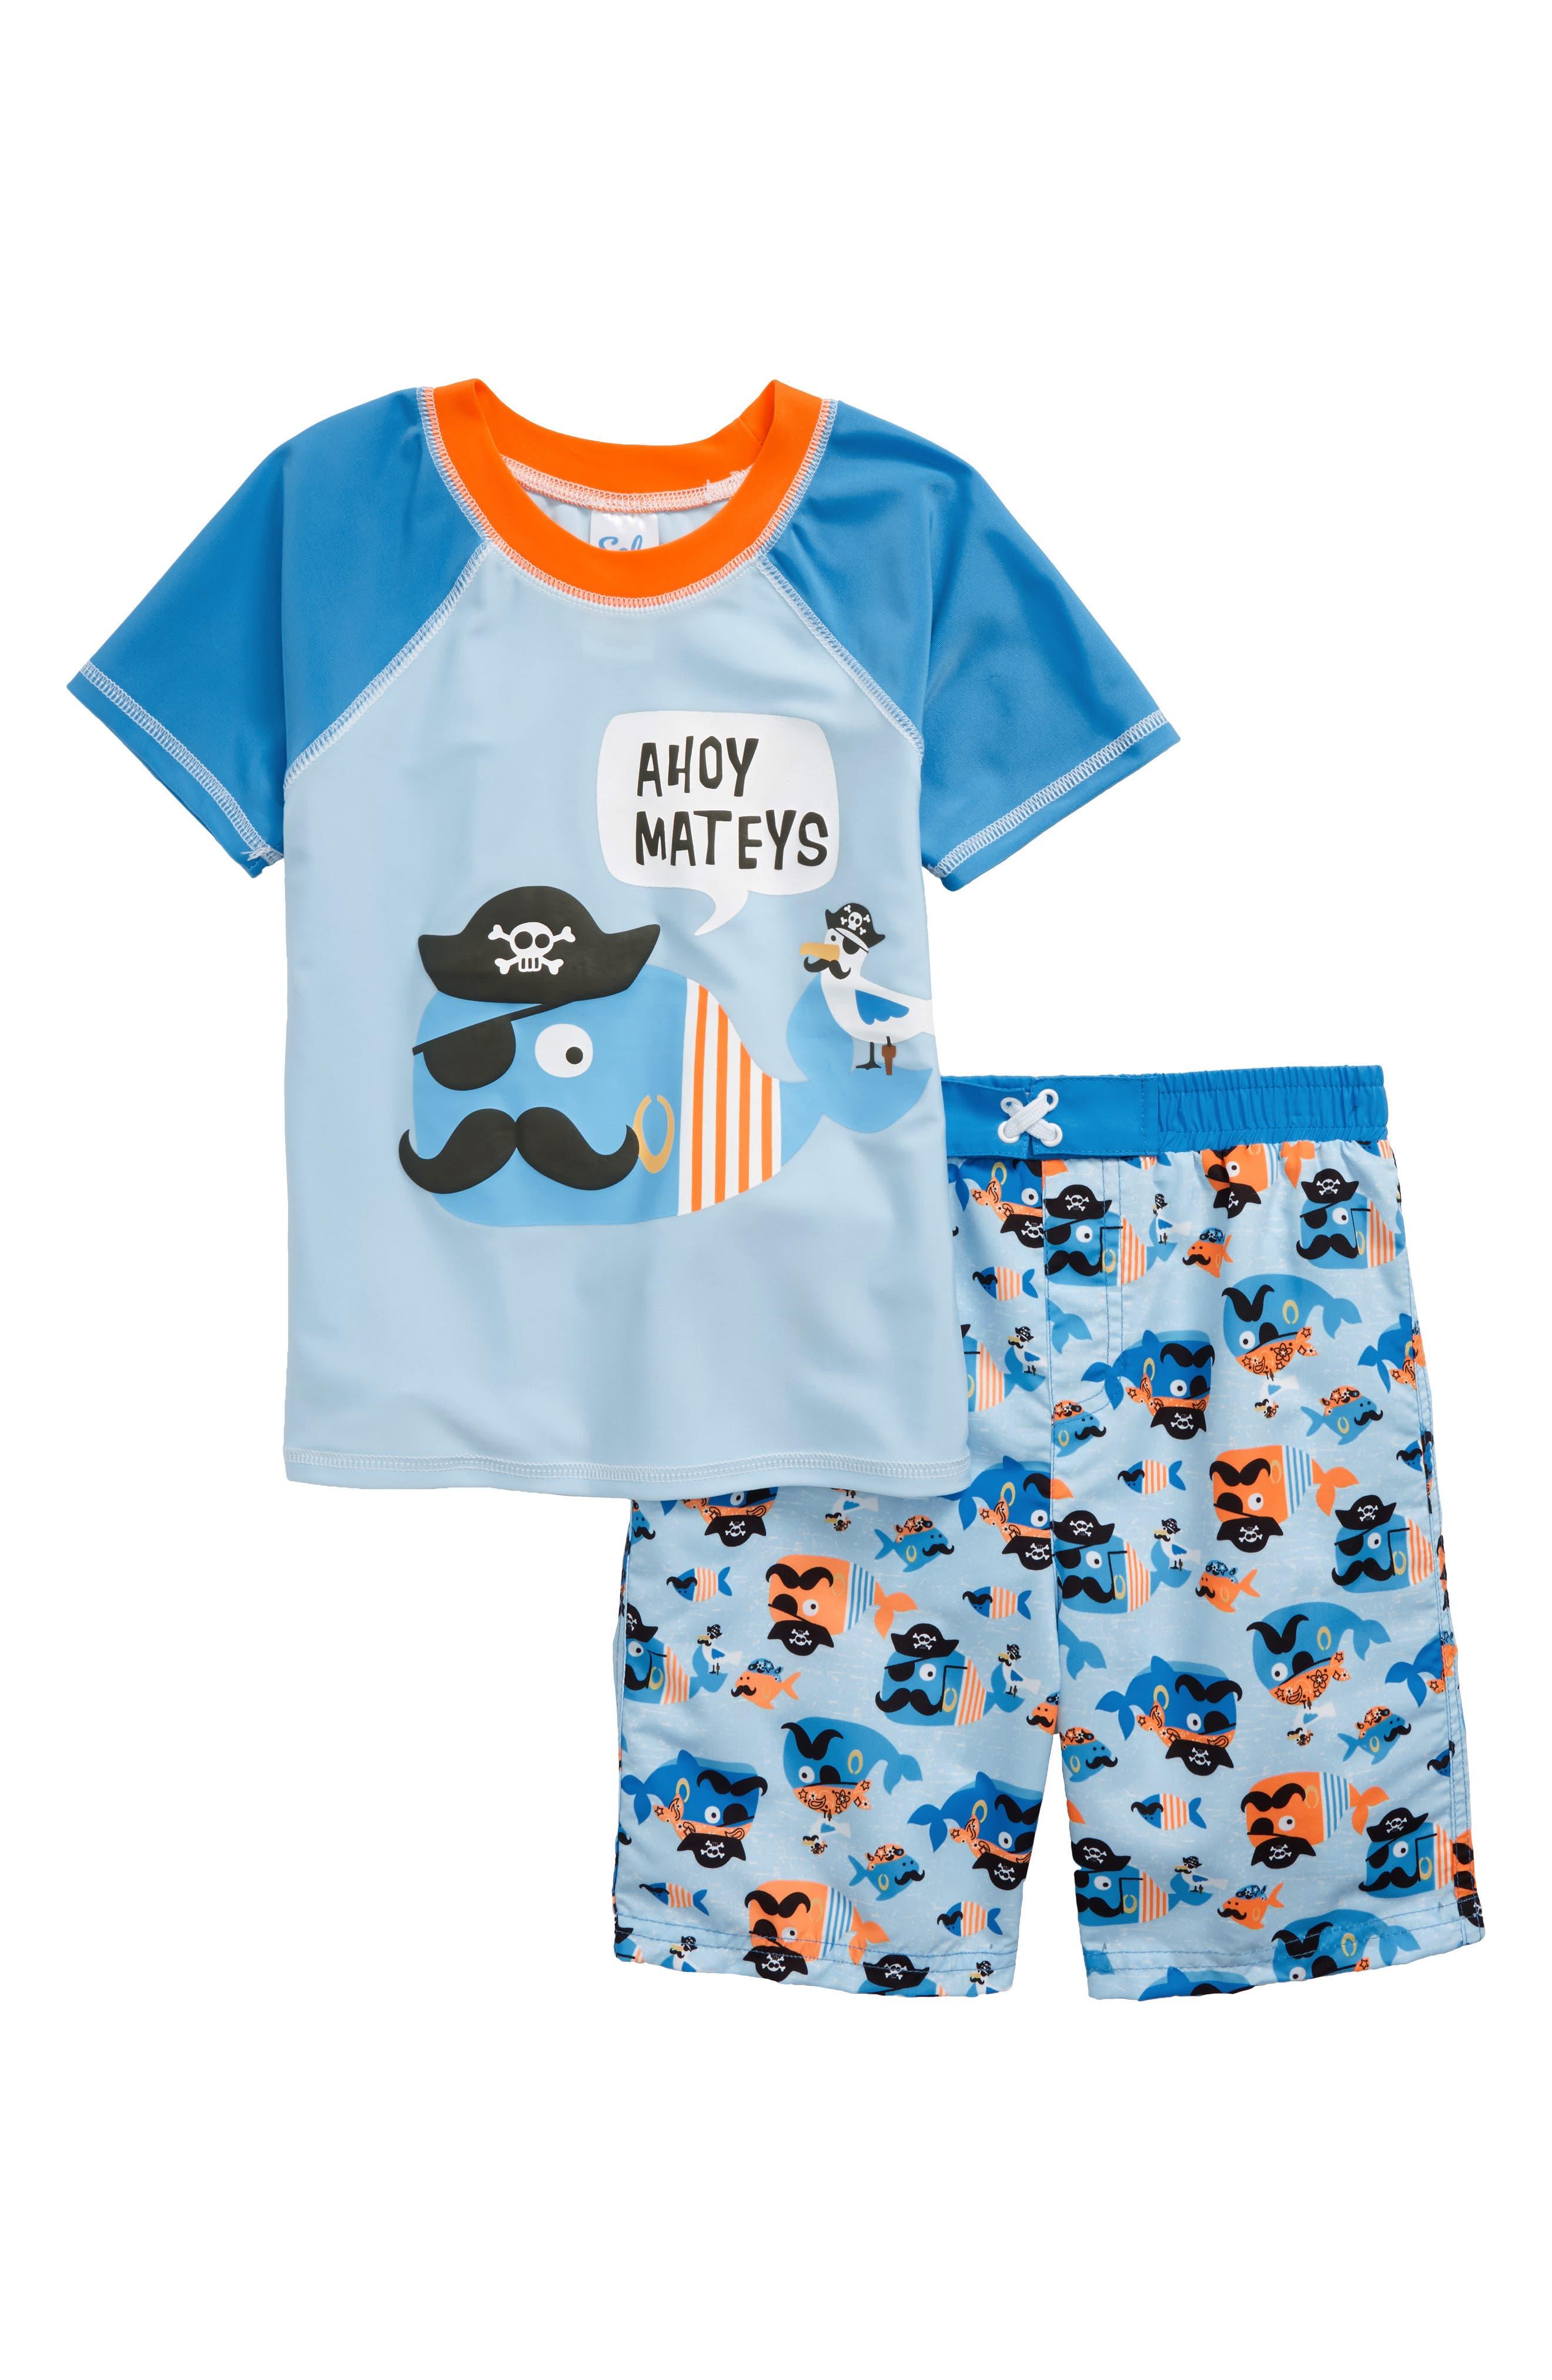 SOL SWIM Ahoy Mateys Two-Piece Rashguard Swimsuit, Main, color, 400